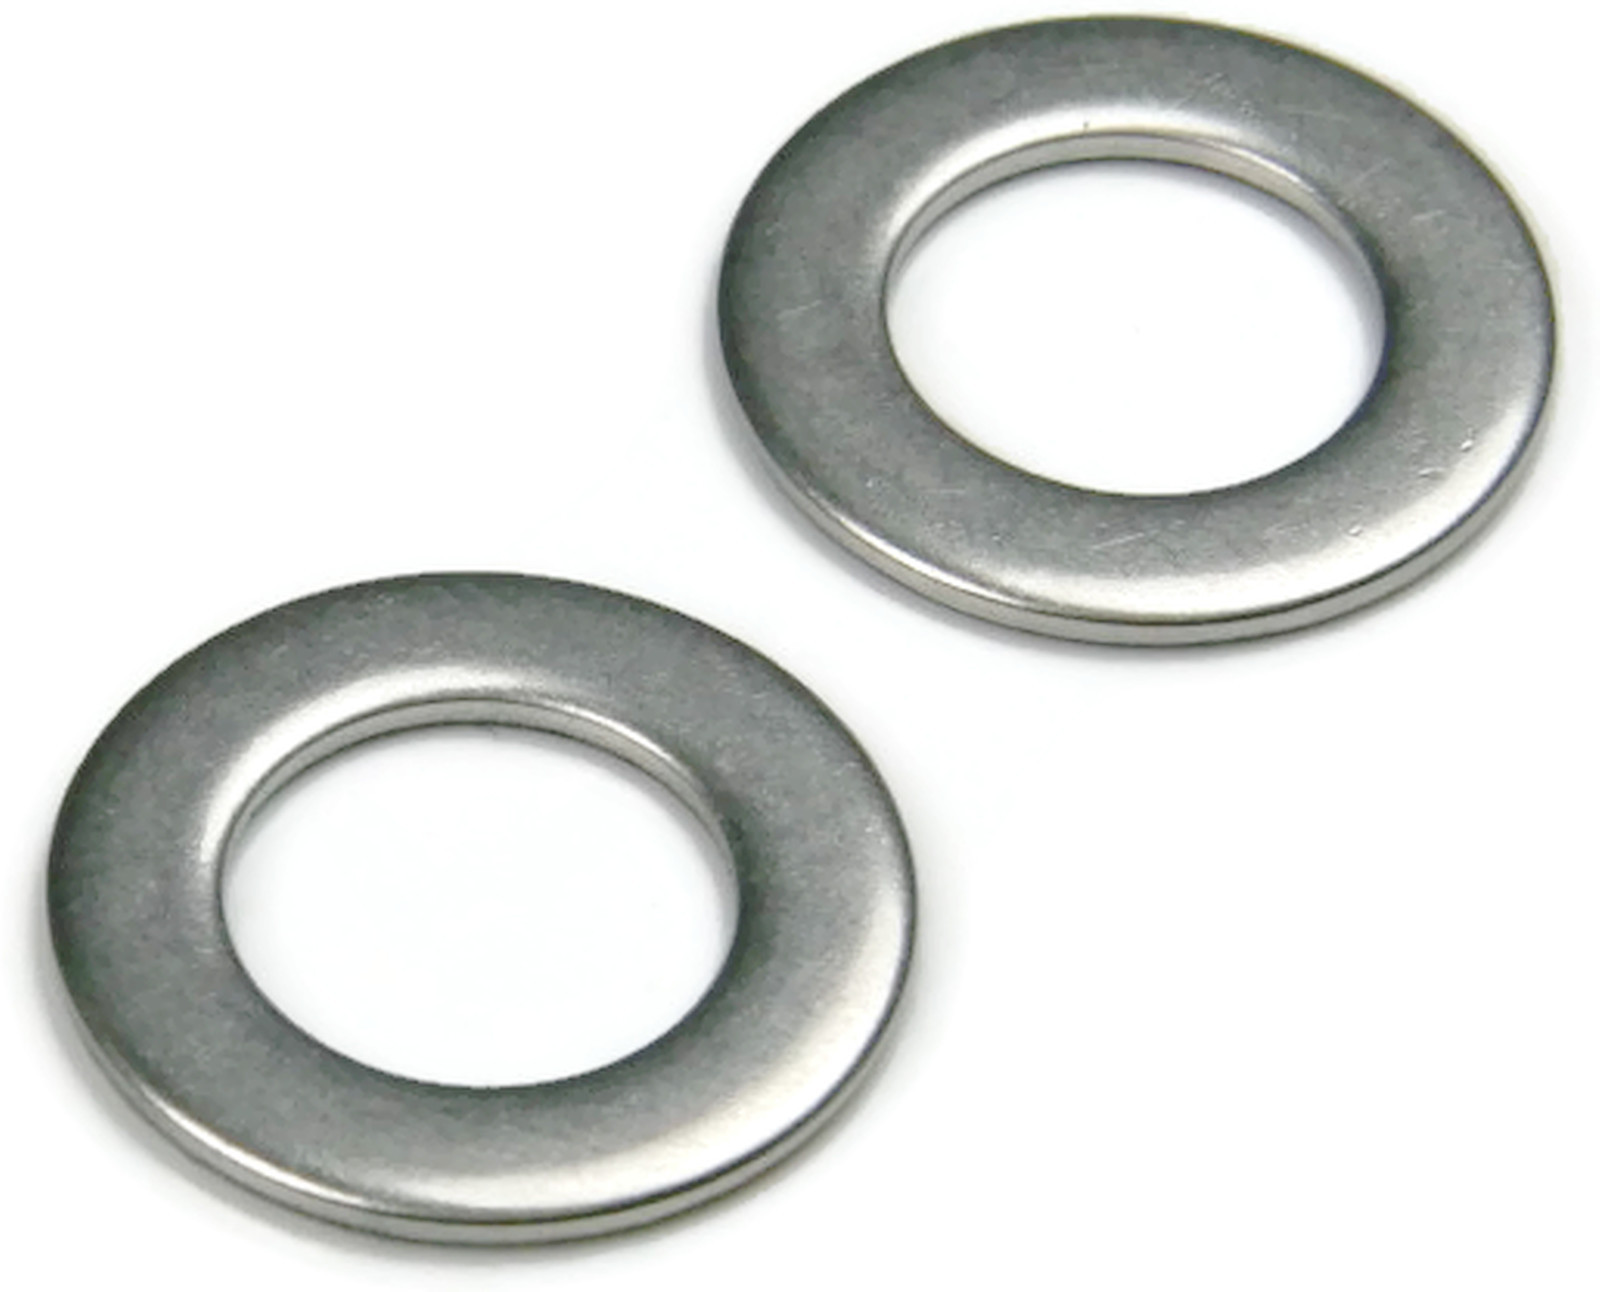 Qty 250 3//8 ID x .625 OD x 1//16 THK Stainless Steel Flat Washer Series 9C616